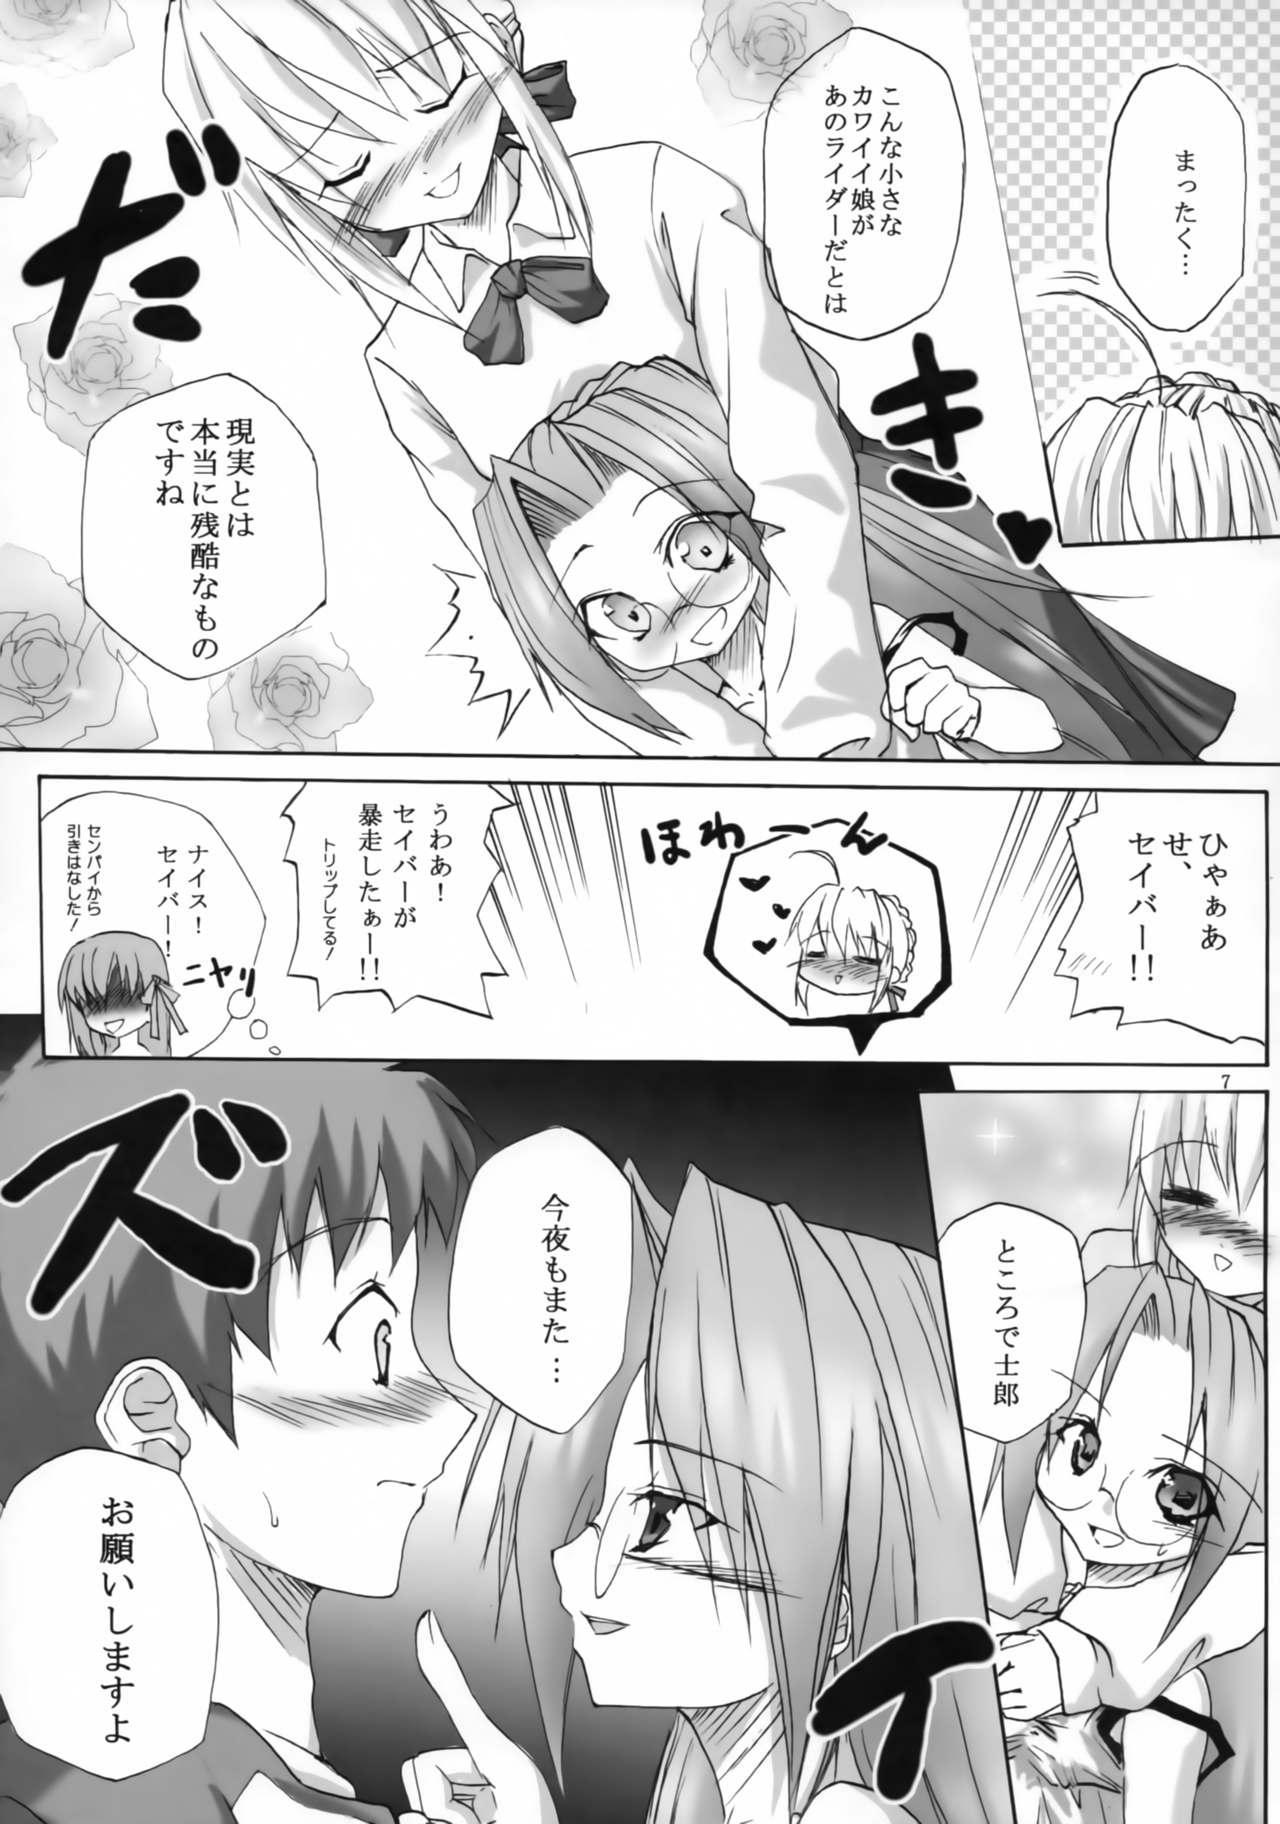 Kiba Musume Mode 5